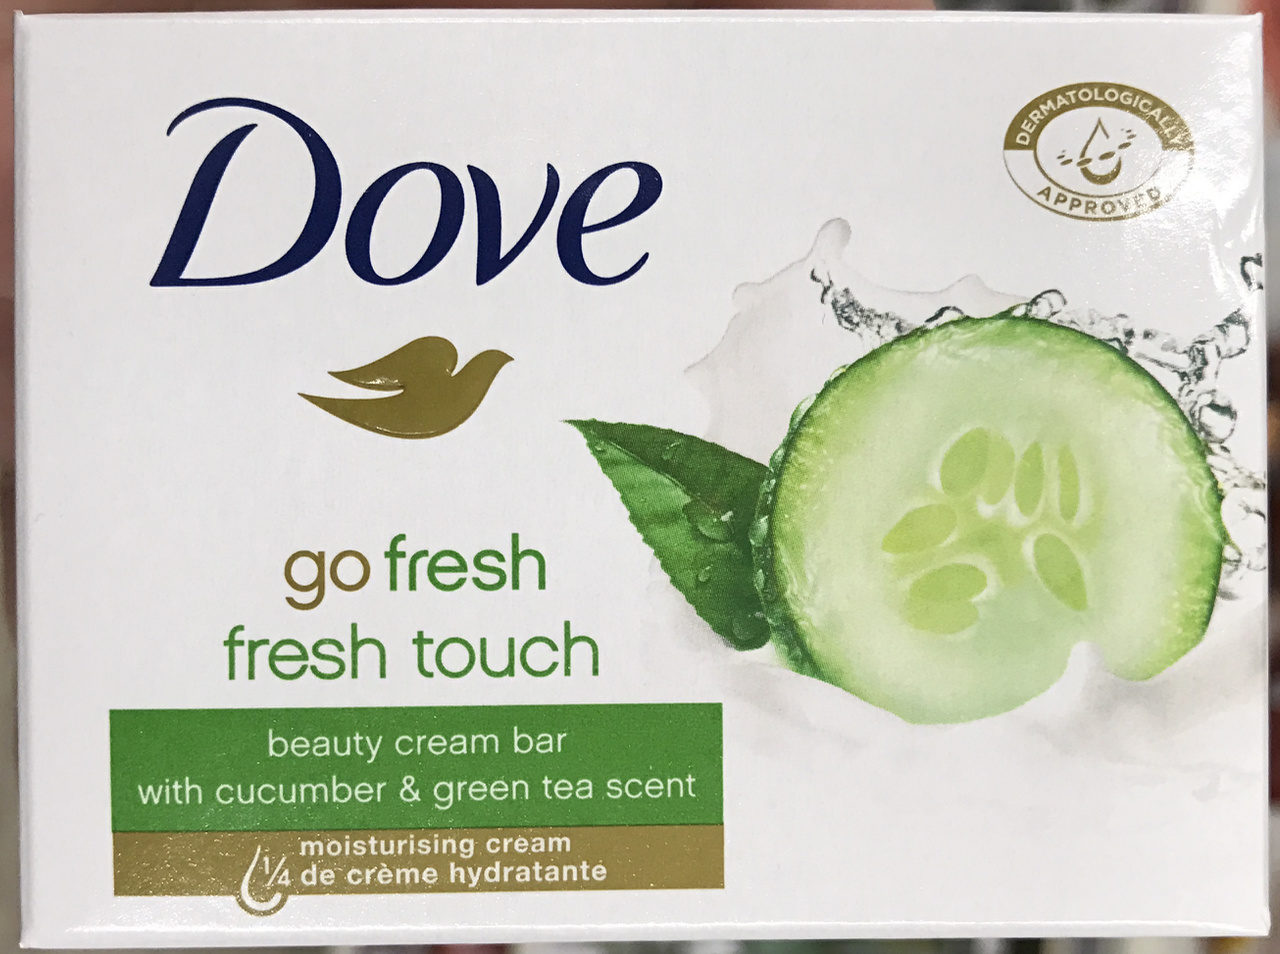 Go Fresh Fresh Touch Beauty Cream Bar with Cucumber & Green Tea Scent - Produit - fr